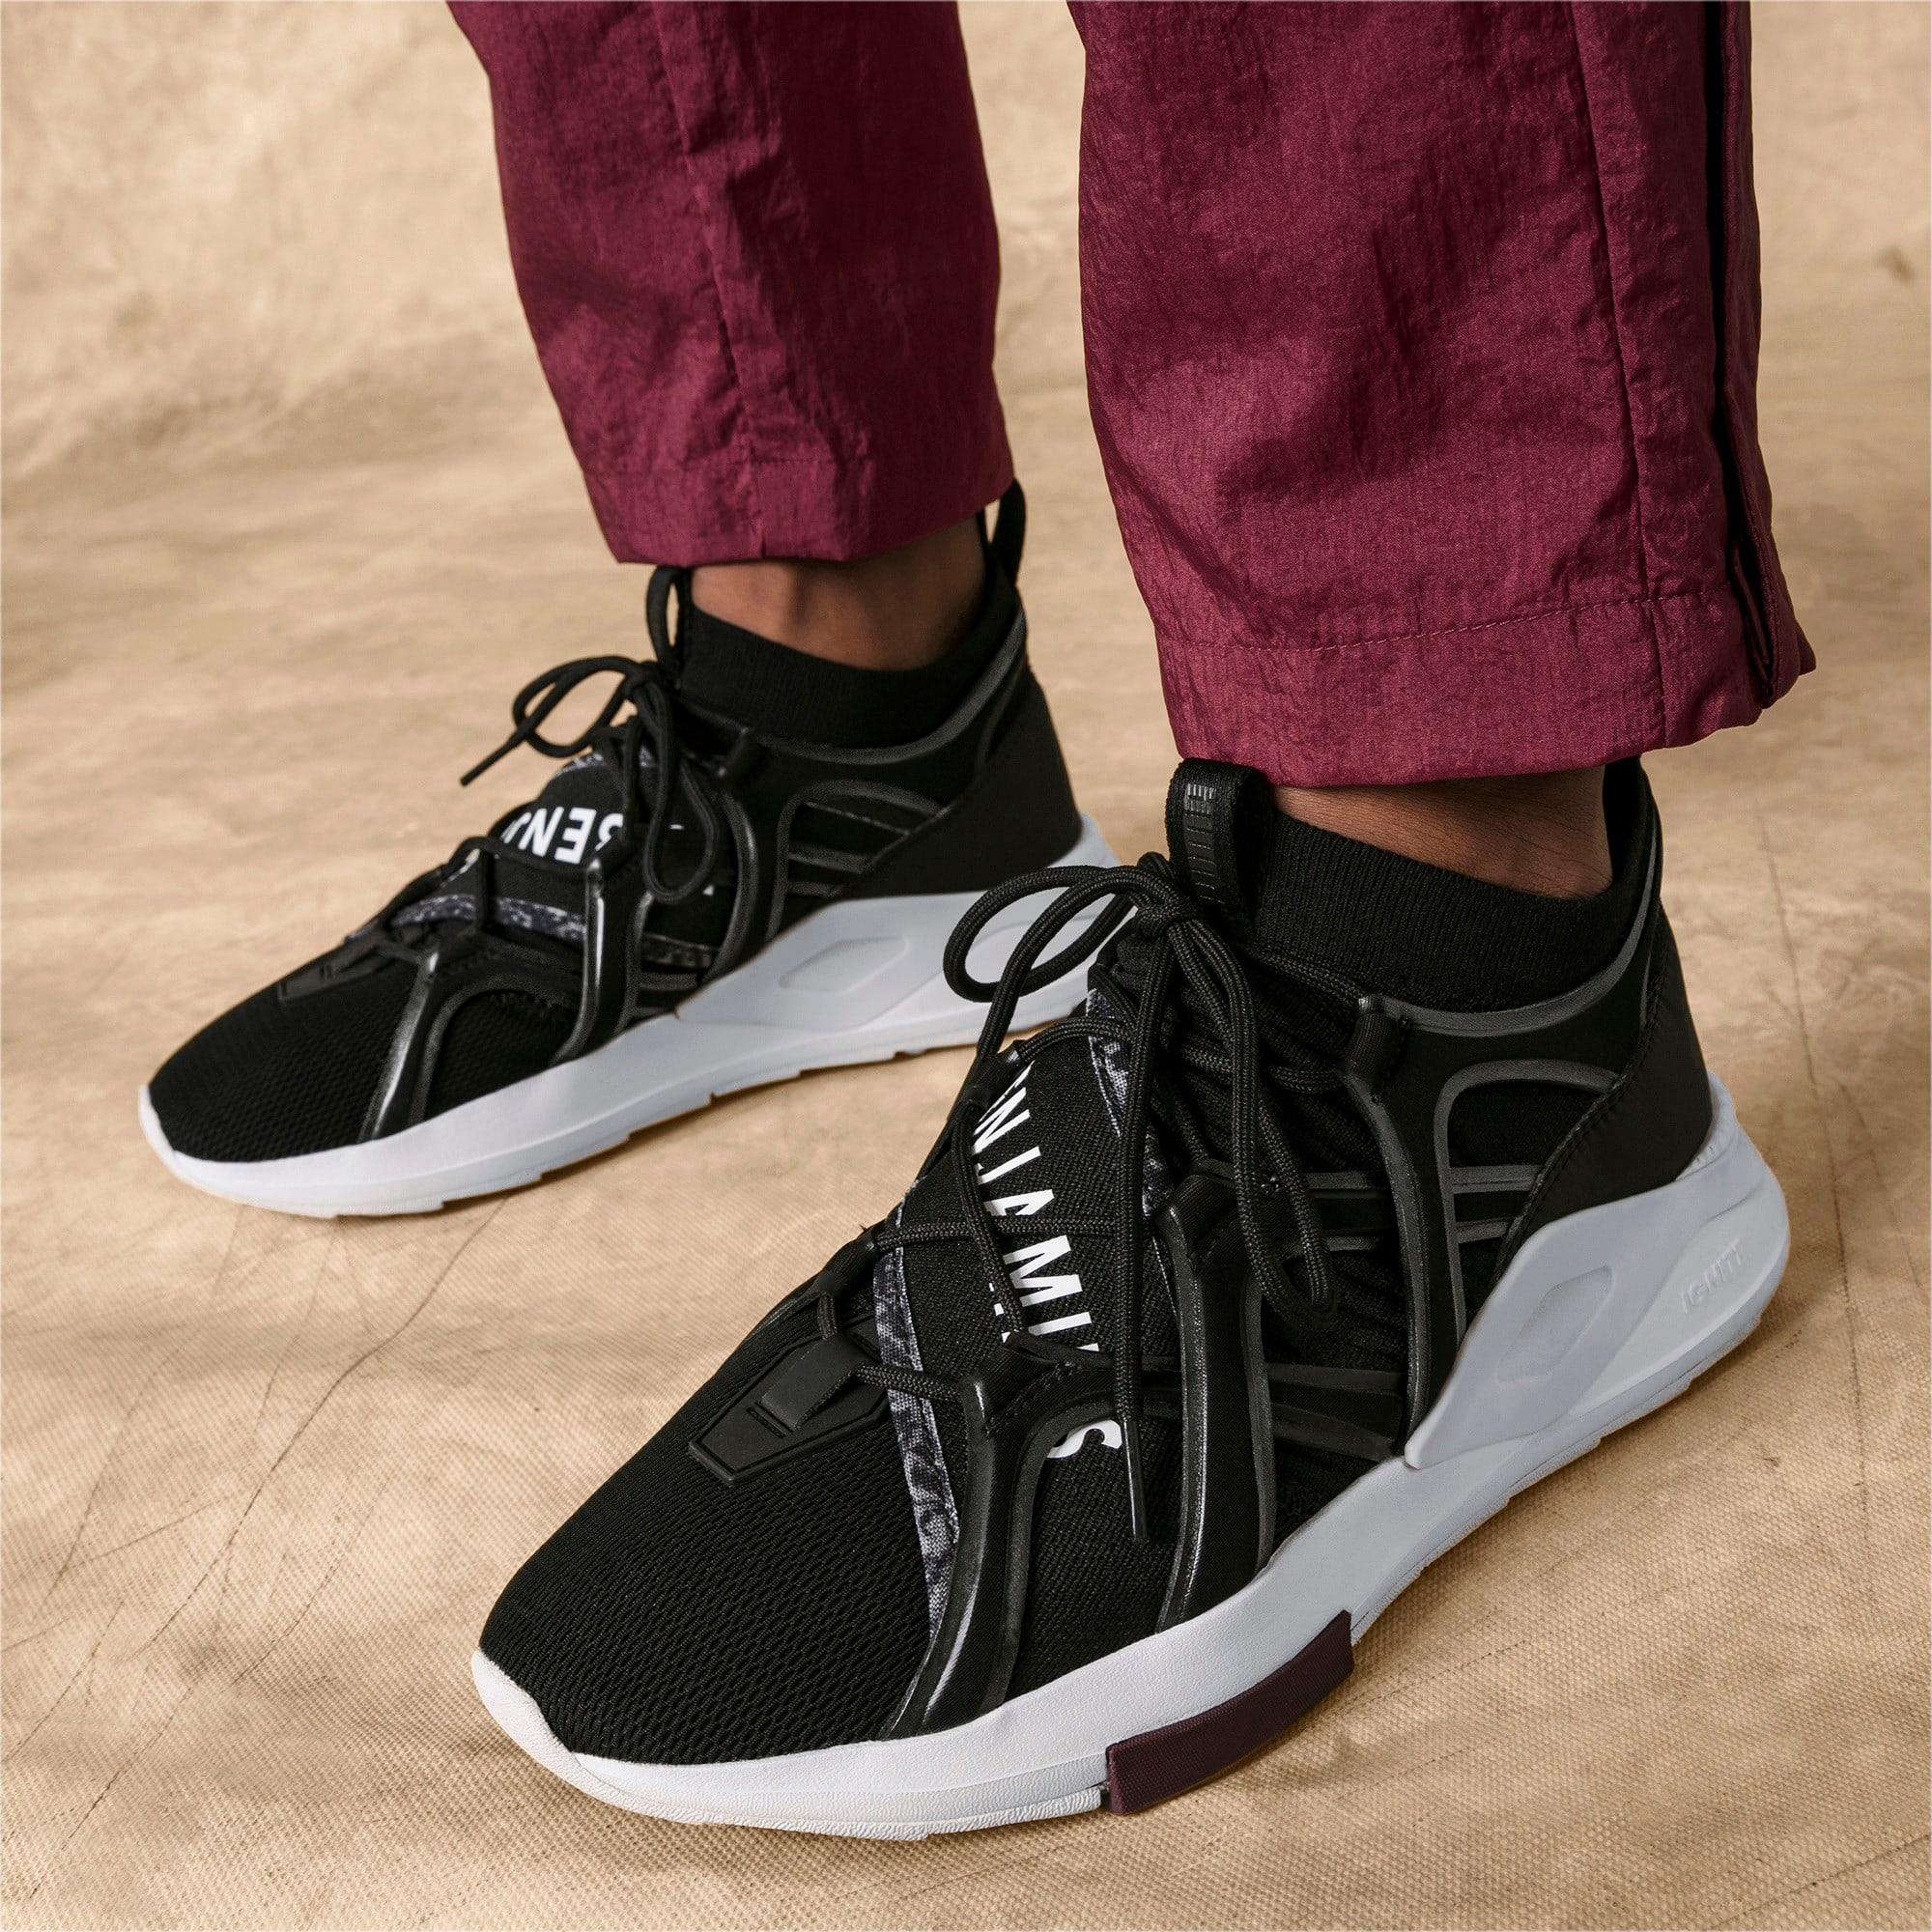 Thumbnail 2 of SHOKU LES BENJAMINS Sneakers, Puma Black, medium